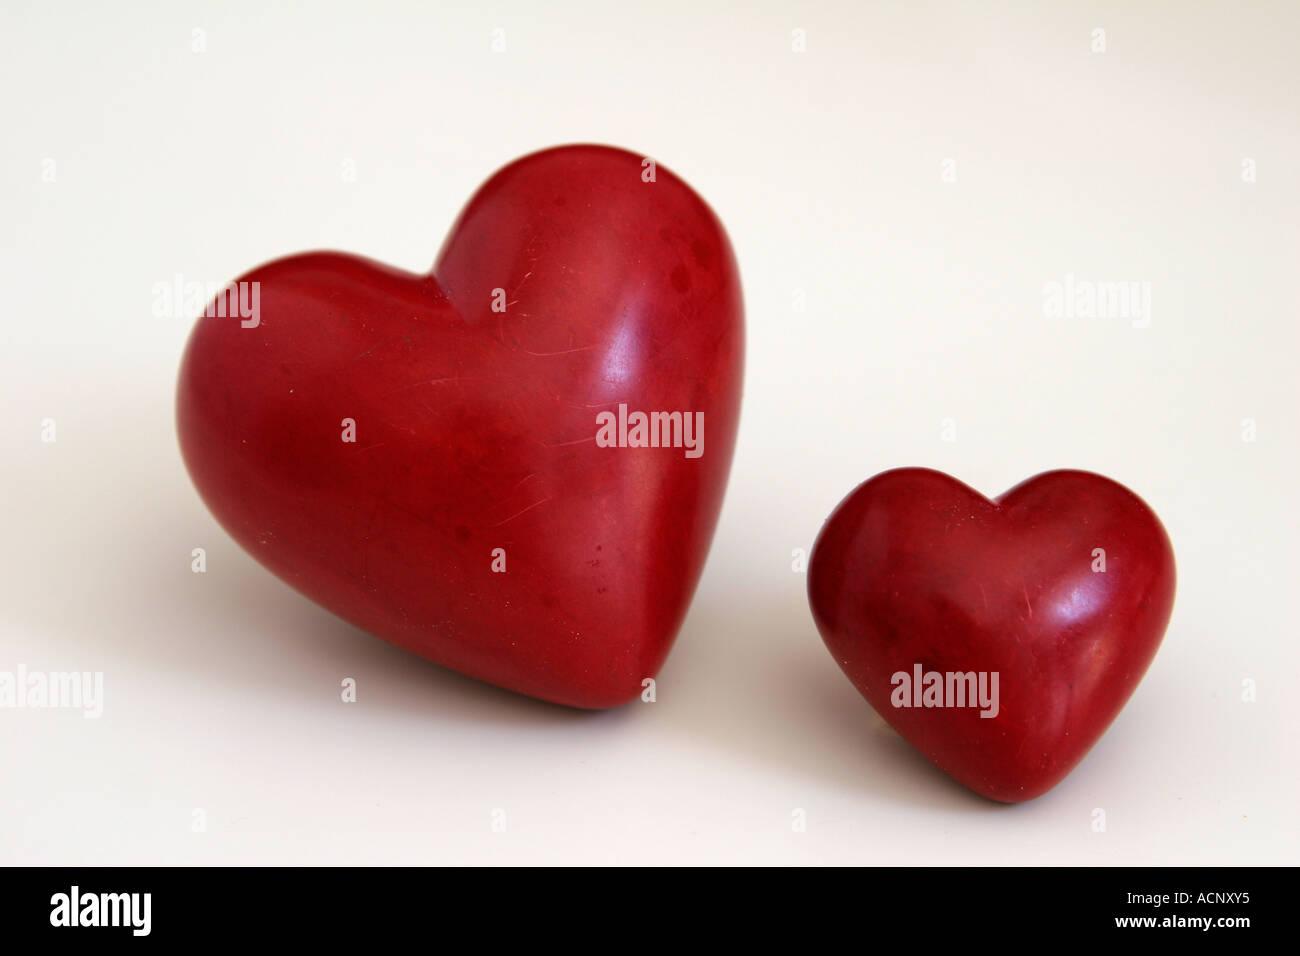 Rote Herzen - Zwei Herzen Stockbild